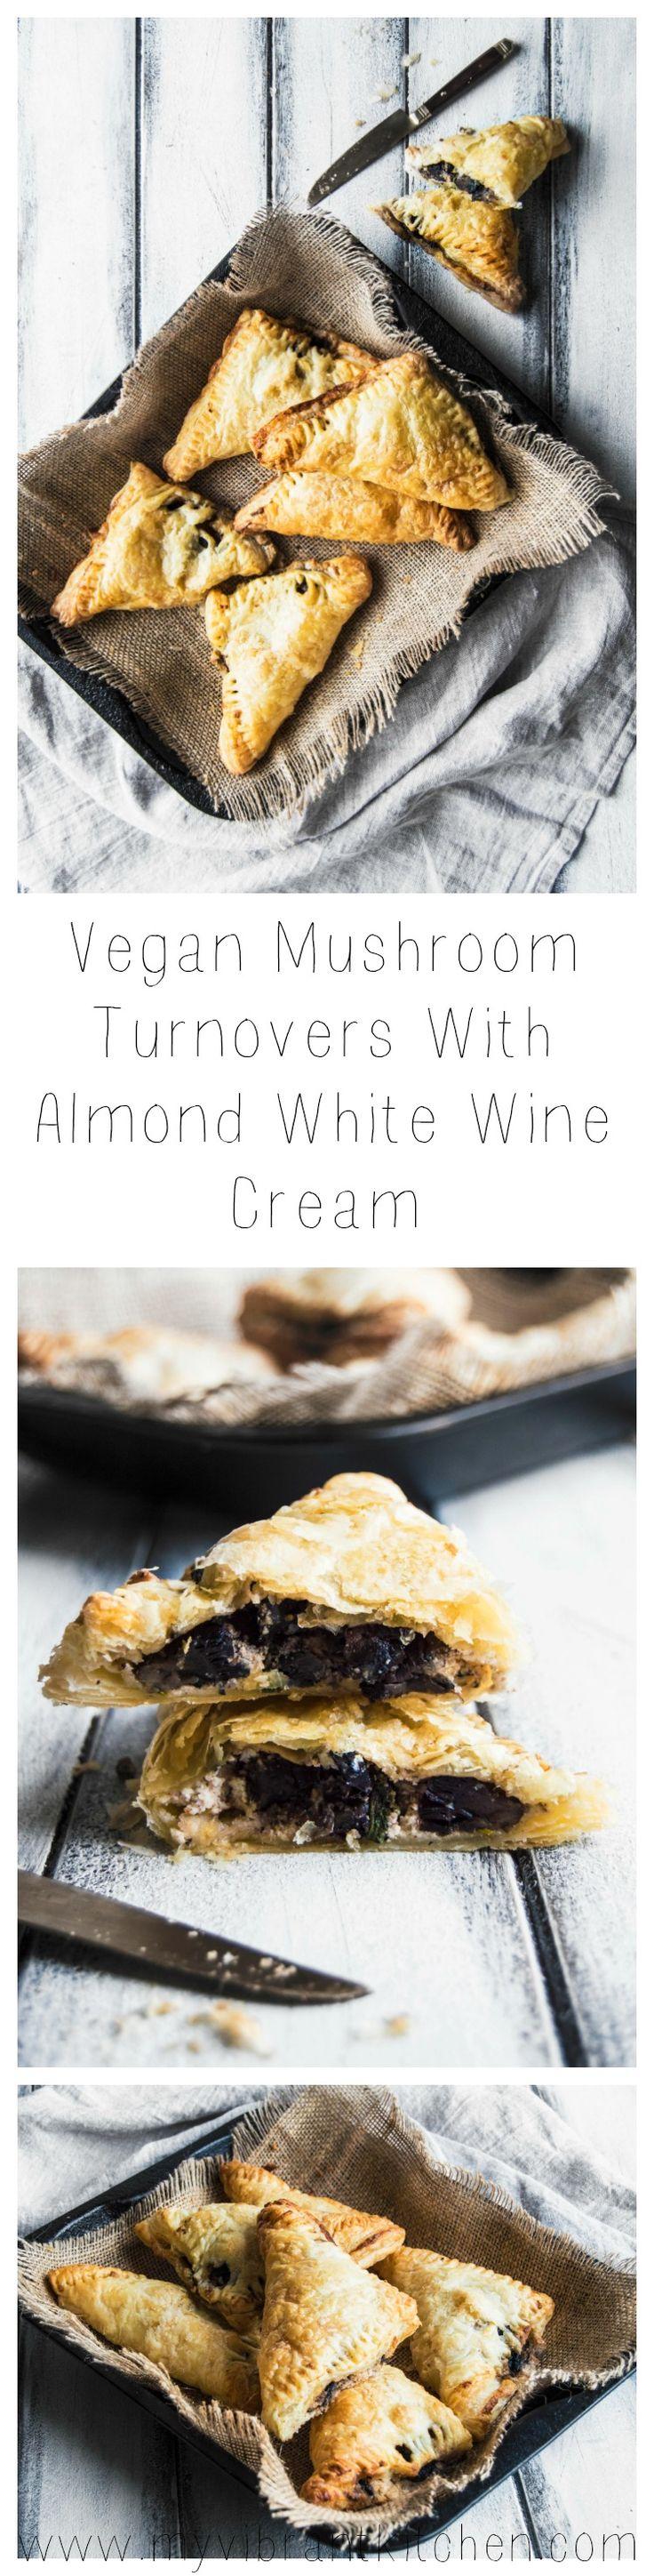 My Vibrant Kitchen | Vegan Sage Mushroom Turnovers With Almond White Wine Cream | myvibrantkitchen.com